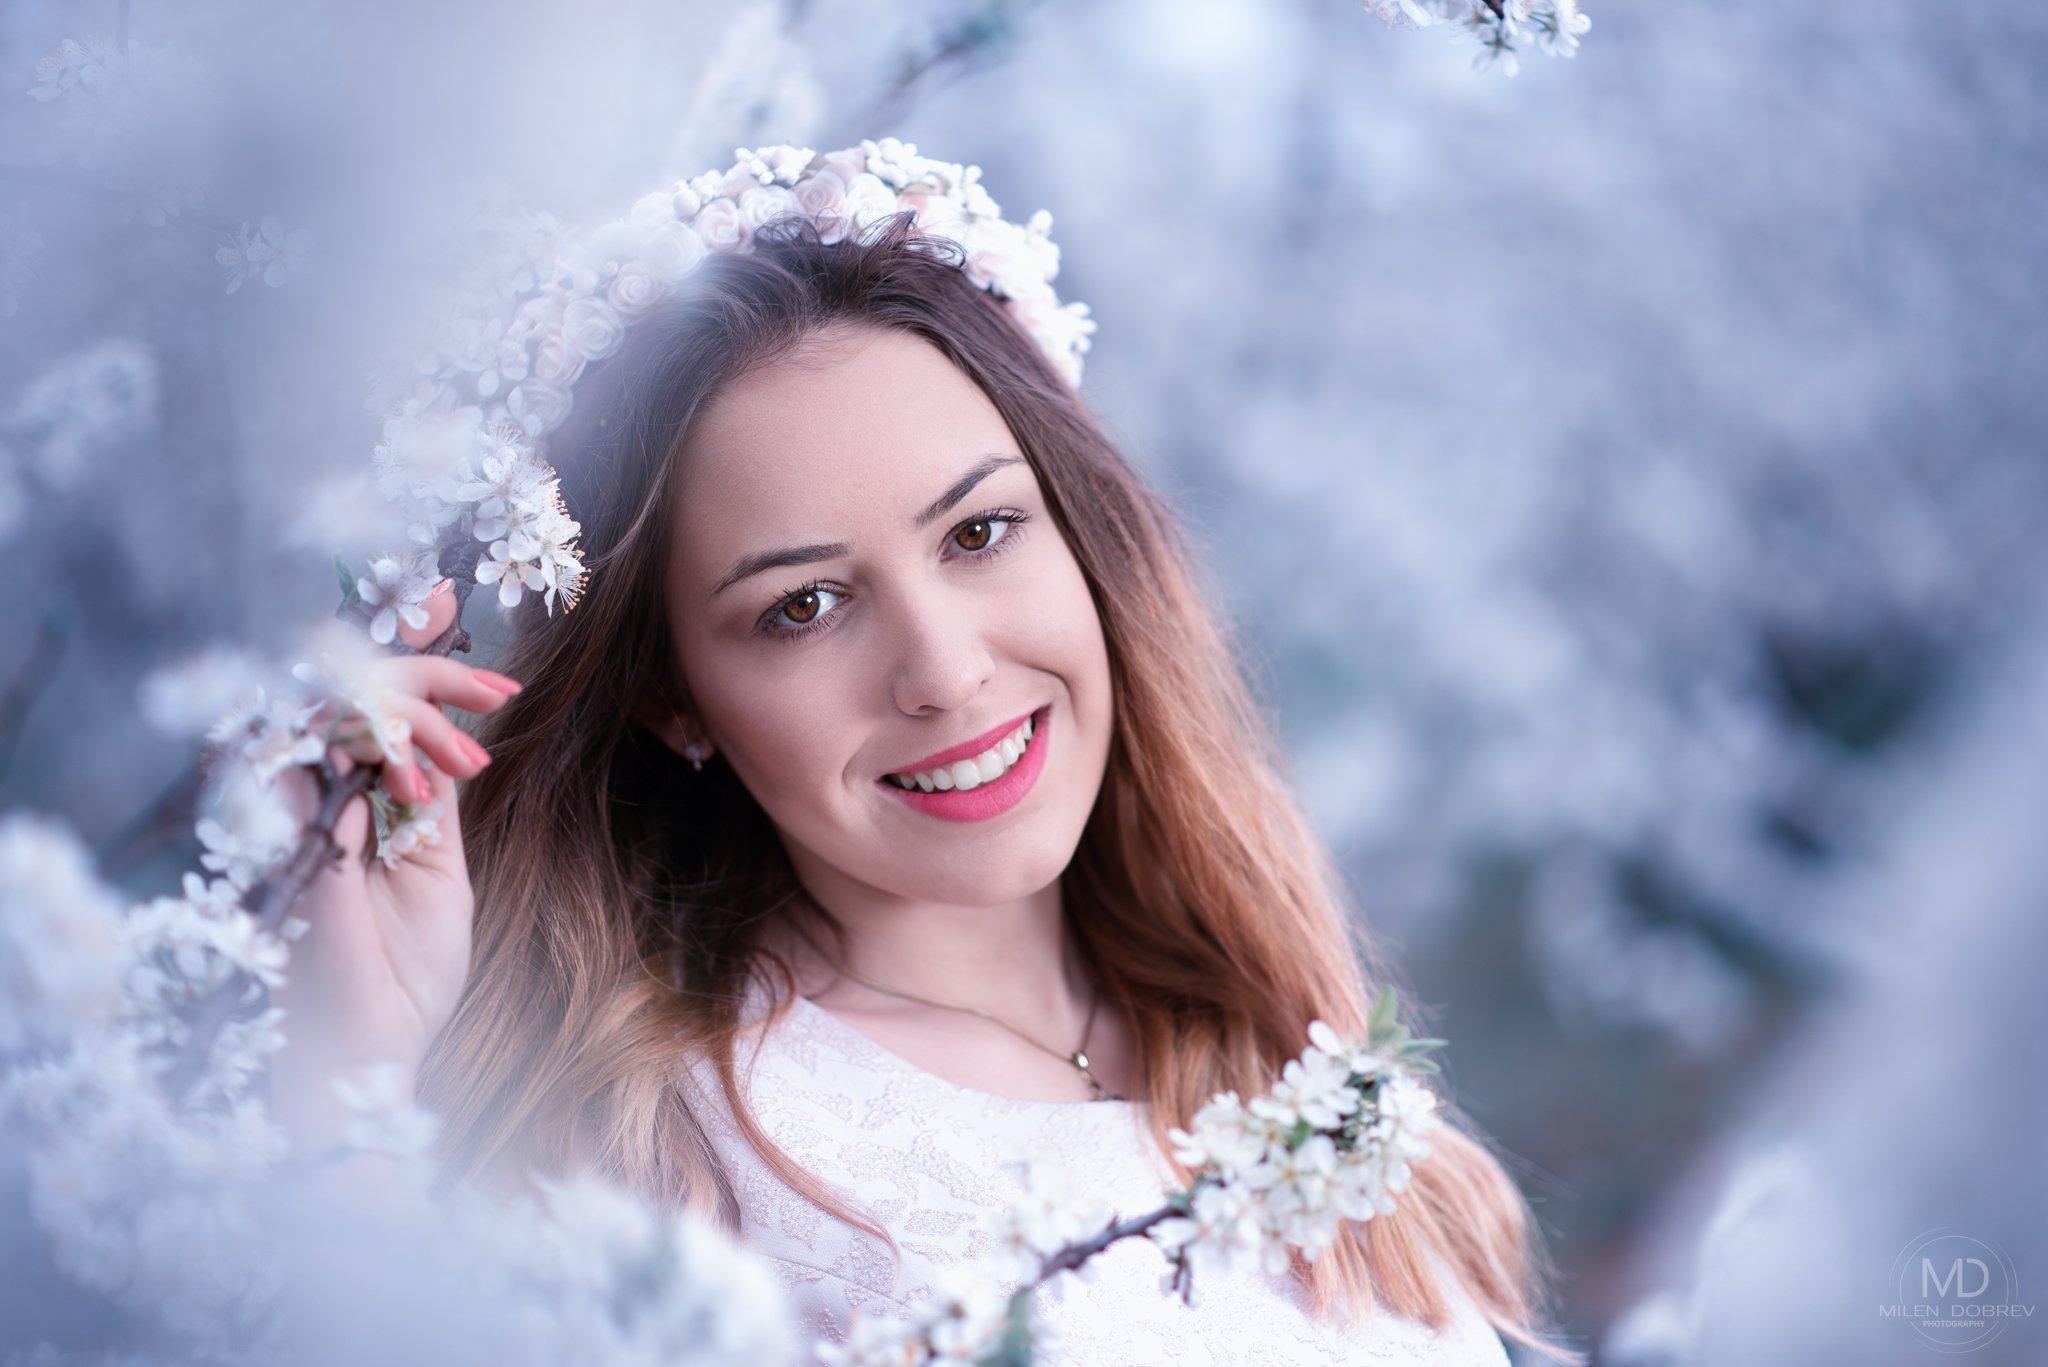 portrait, spring, blossom, beauty, girl,, Милен Добрев